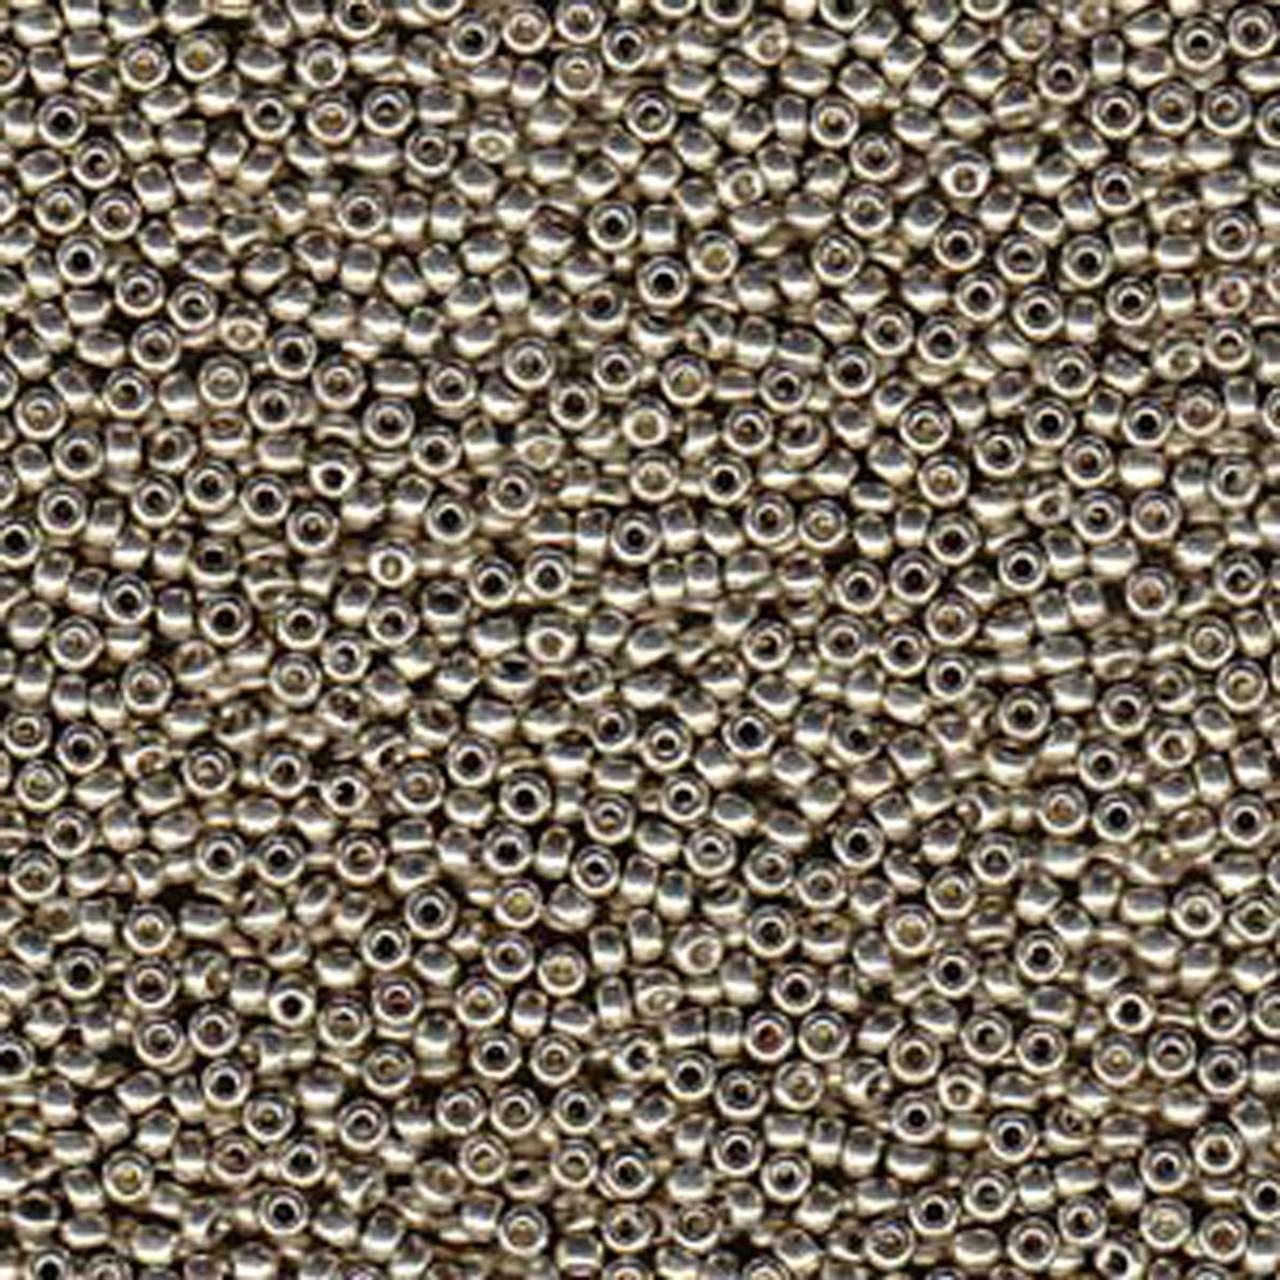 medium resolution of duracoat galvanized light smokey pewter miyuki 11 0 rocailles glass seed beads 24 grams